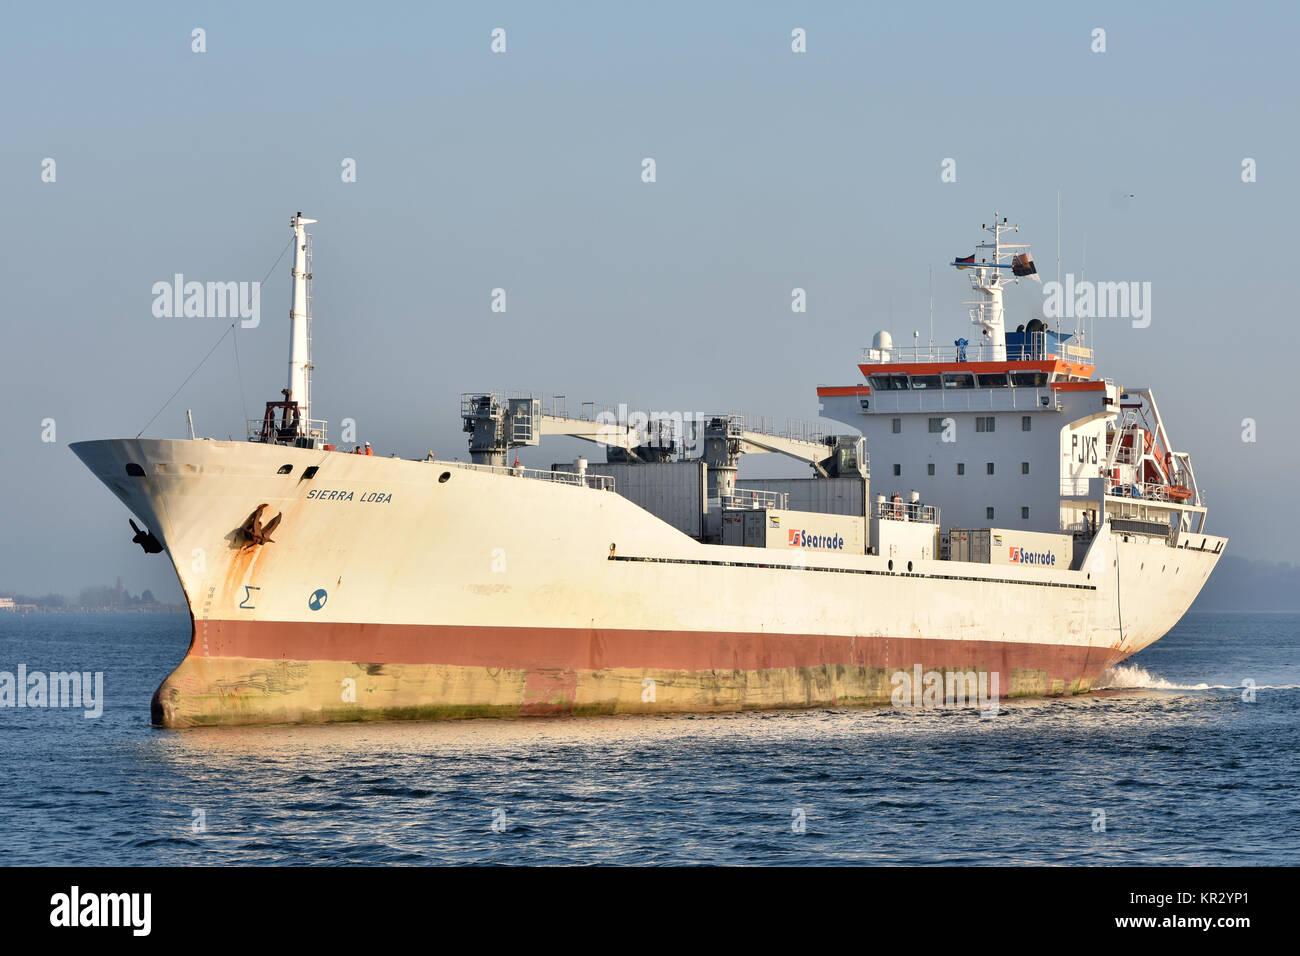 Sierra Loba - Stock Image